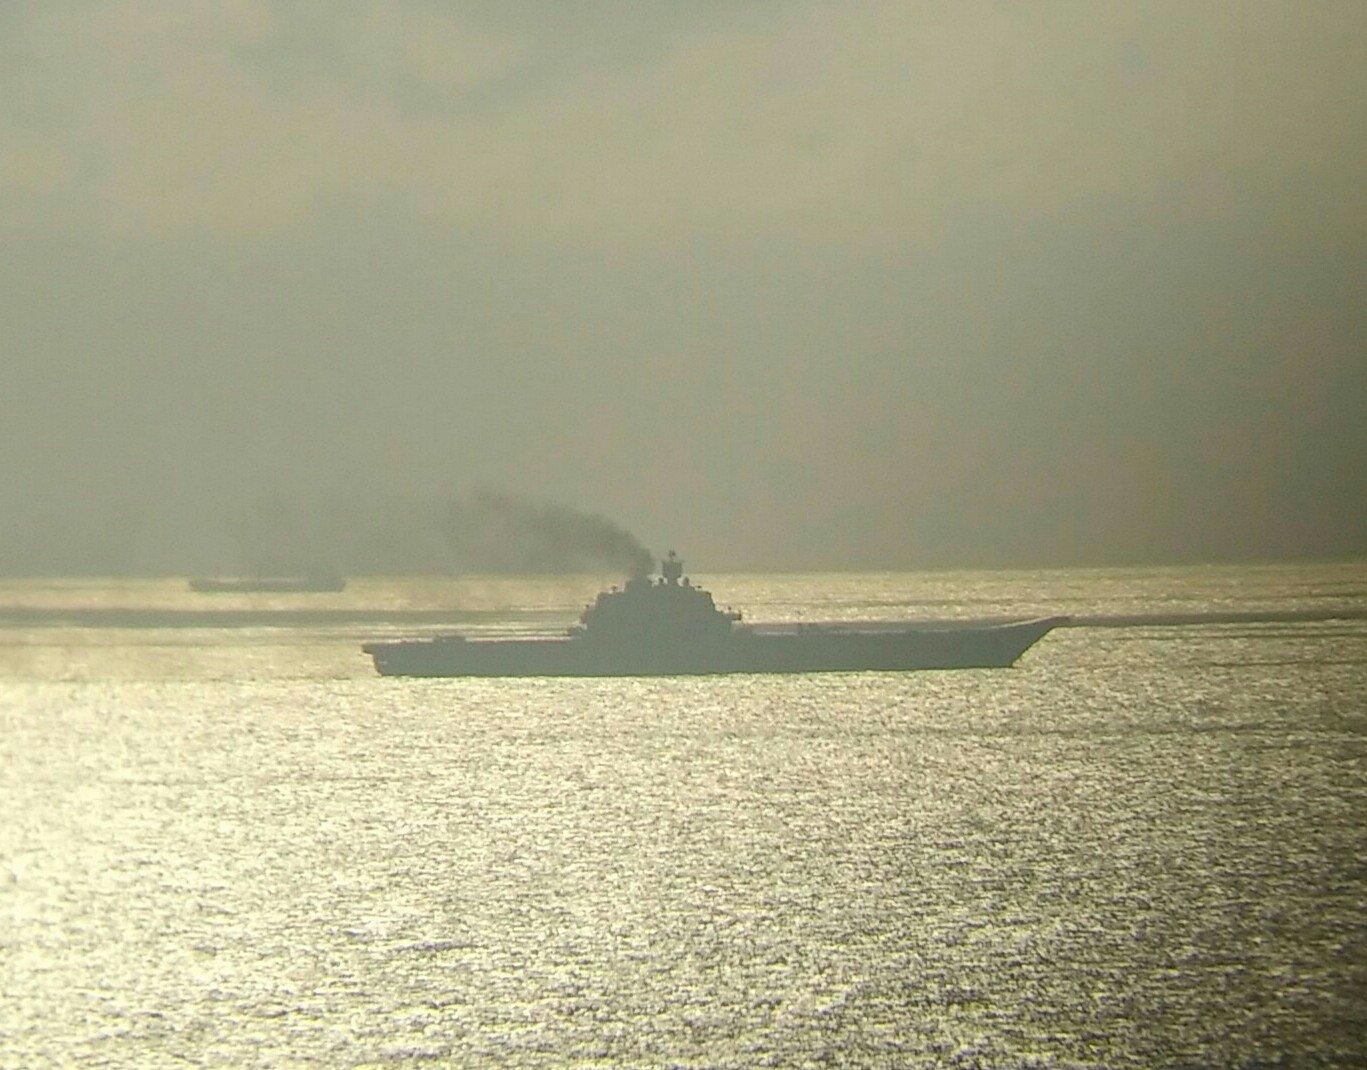 Russian Navy: Status & News #3 - Page 3 CvSJr0cVUAE9QXz